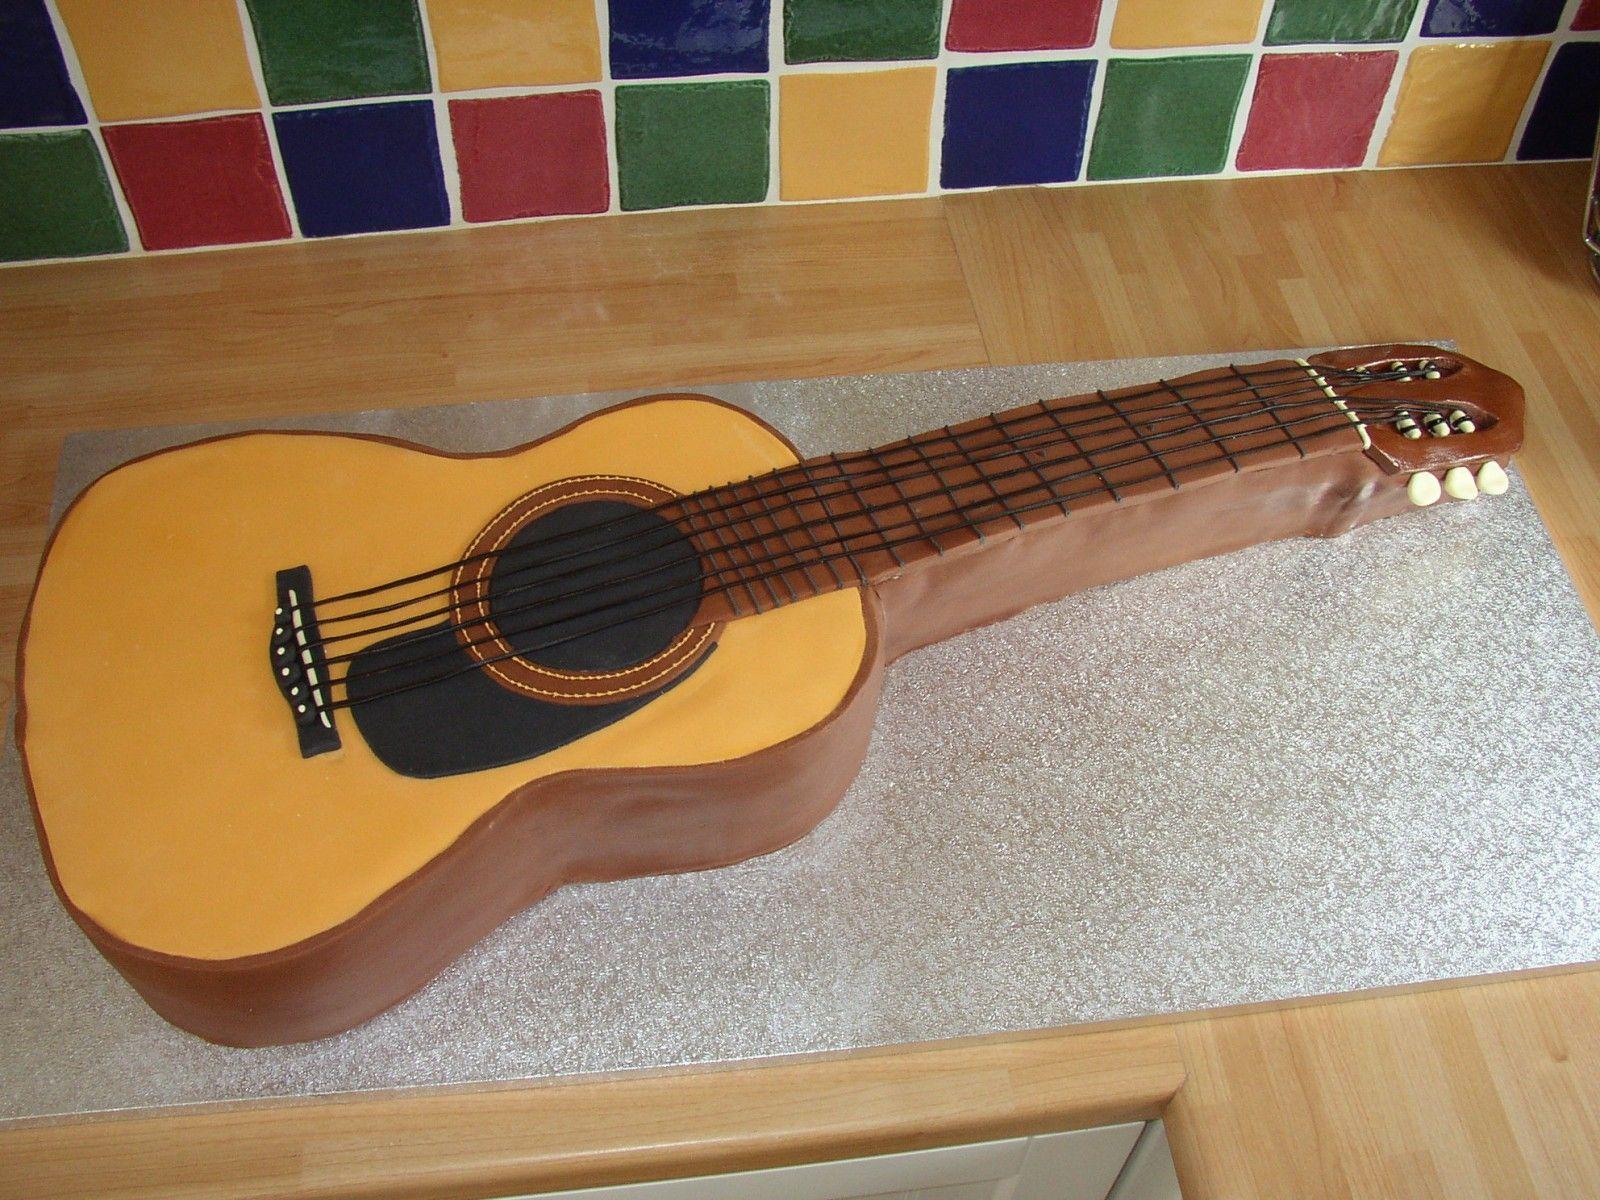 acoustic guitar shaped cake ideas and designs. Black Bedroom Furniture Sets. Home Design Ideas